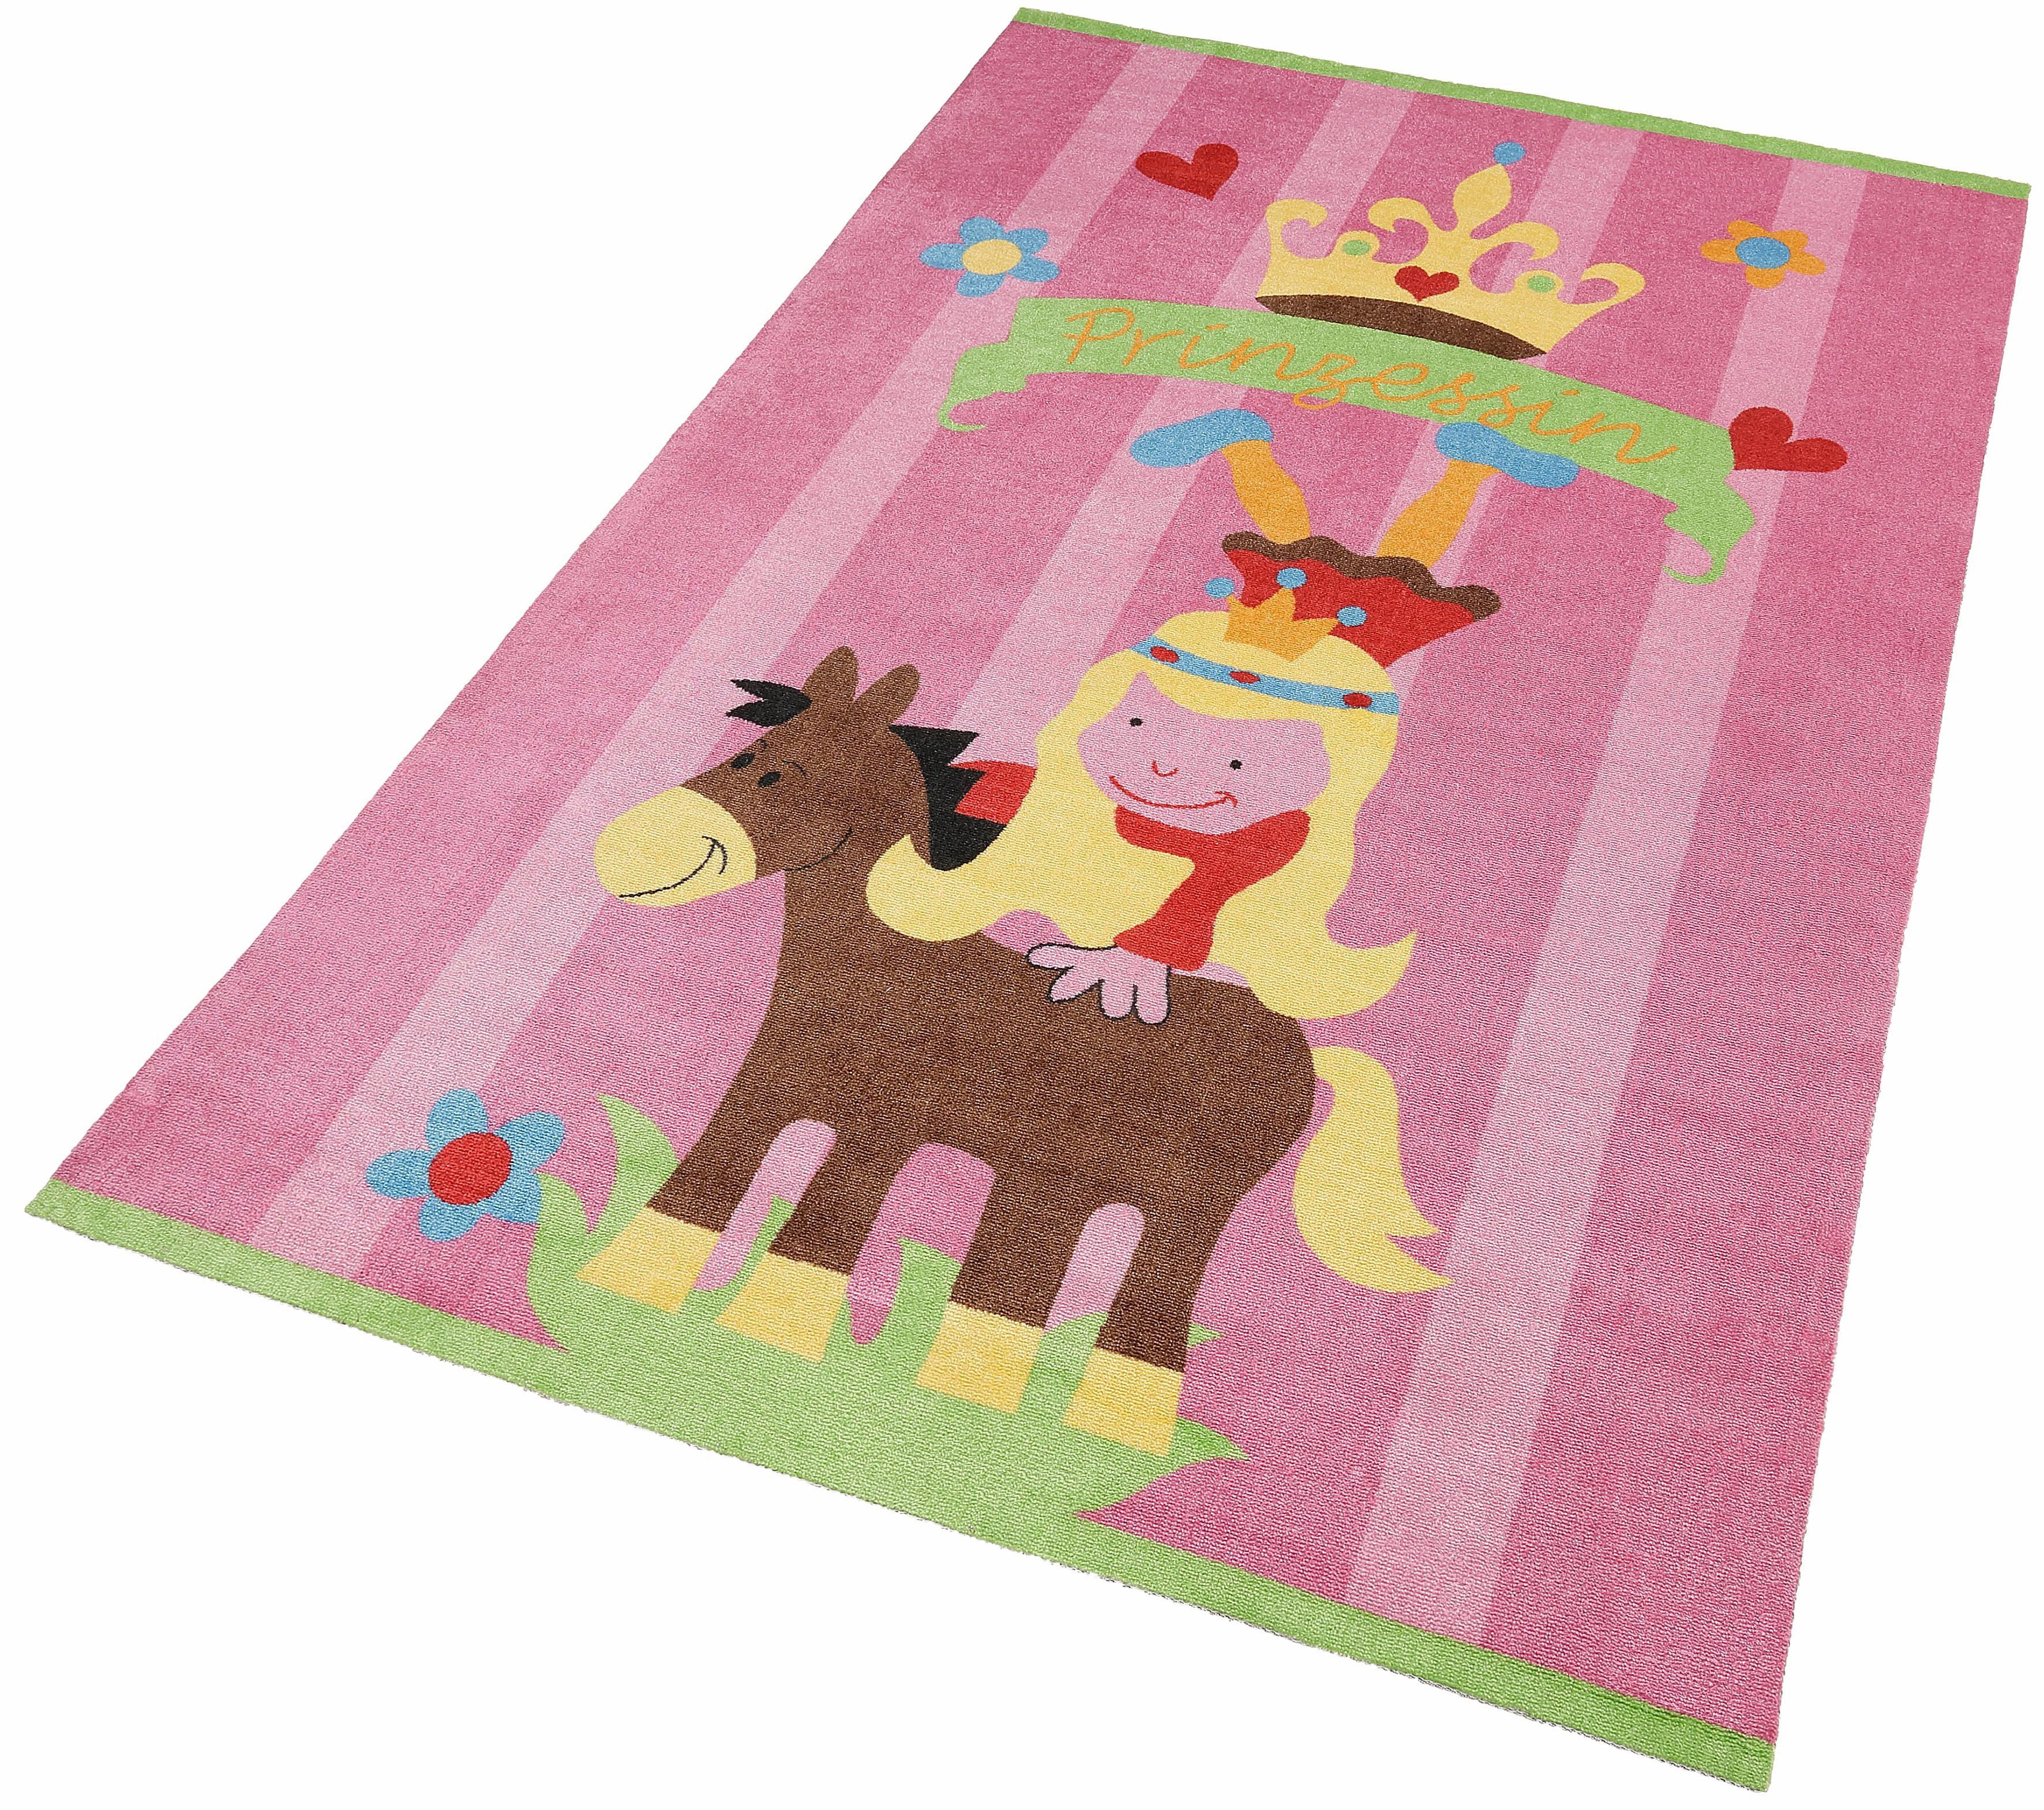 Kinderteppich Mamba3 THEKO rechteckig Höhe 12 mm gedruckt